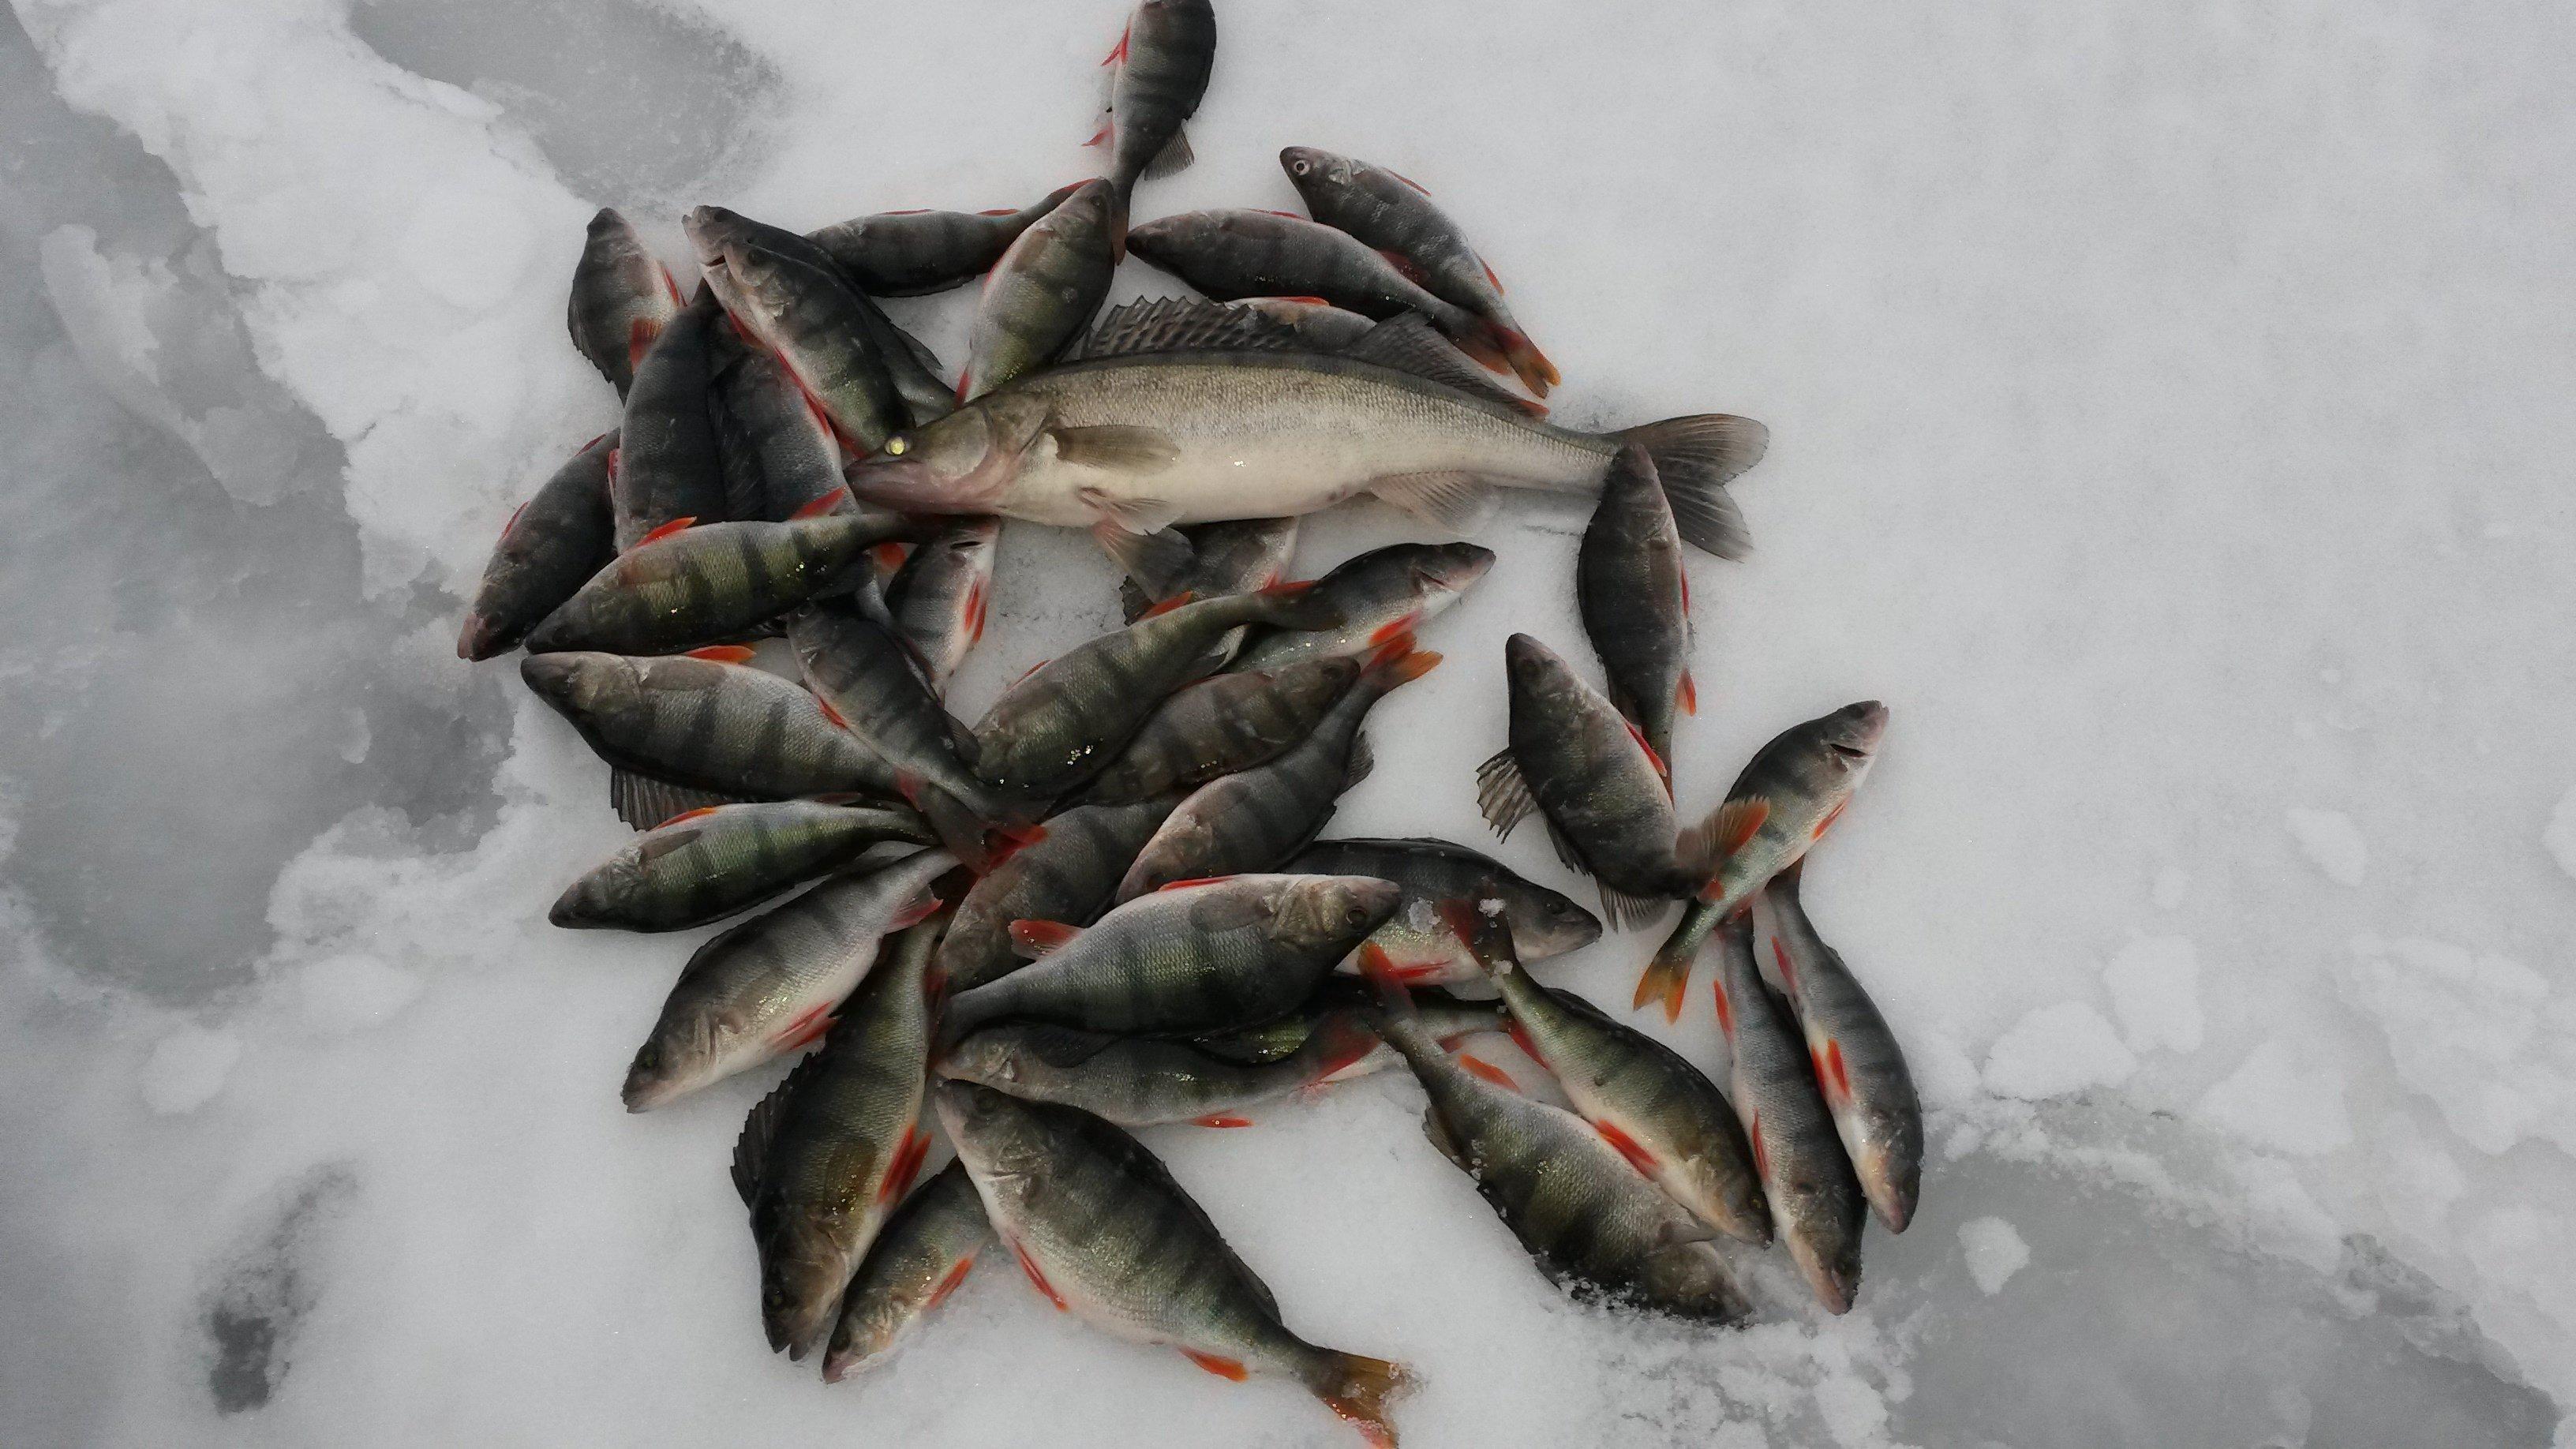 Форум о рыбалке е1